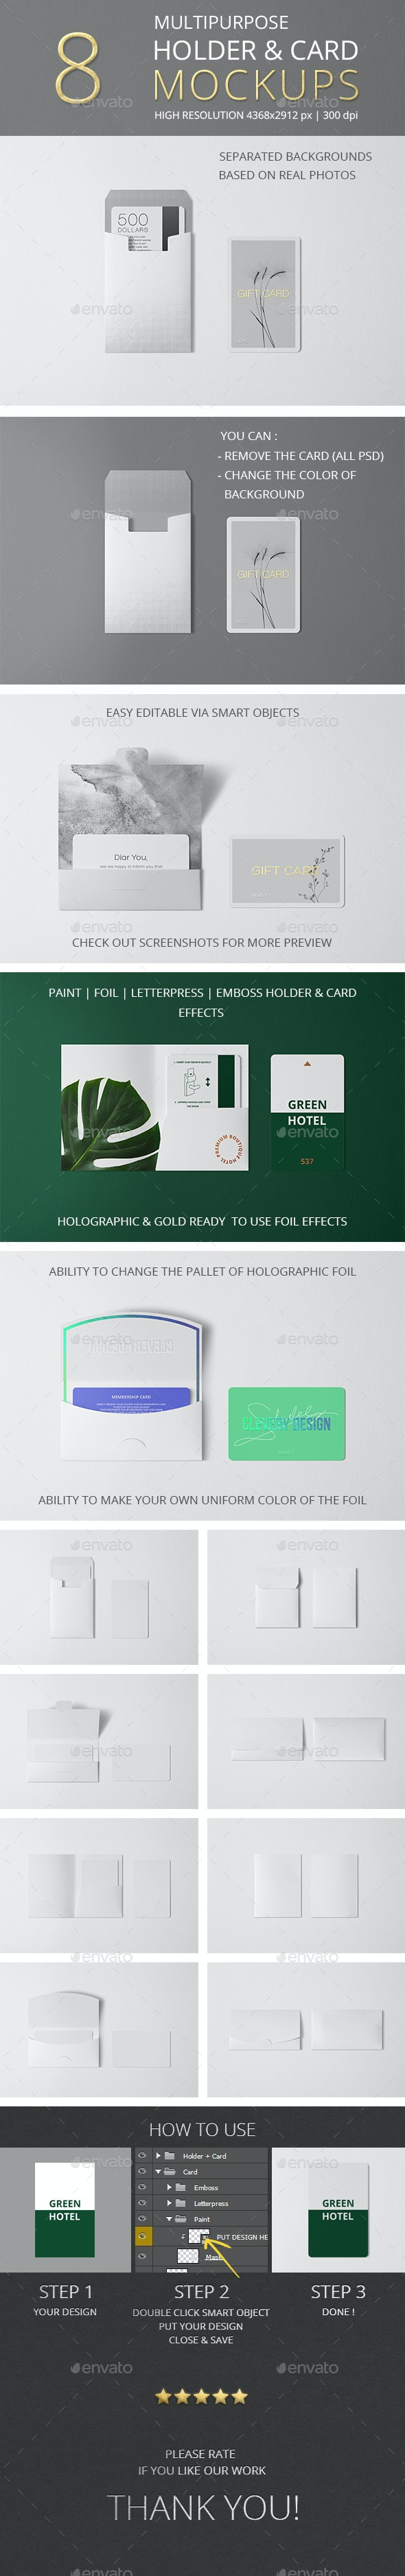 Multipurpose Holder & Card Mockup Vol 8.0 - Miscellaneous Print